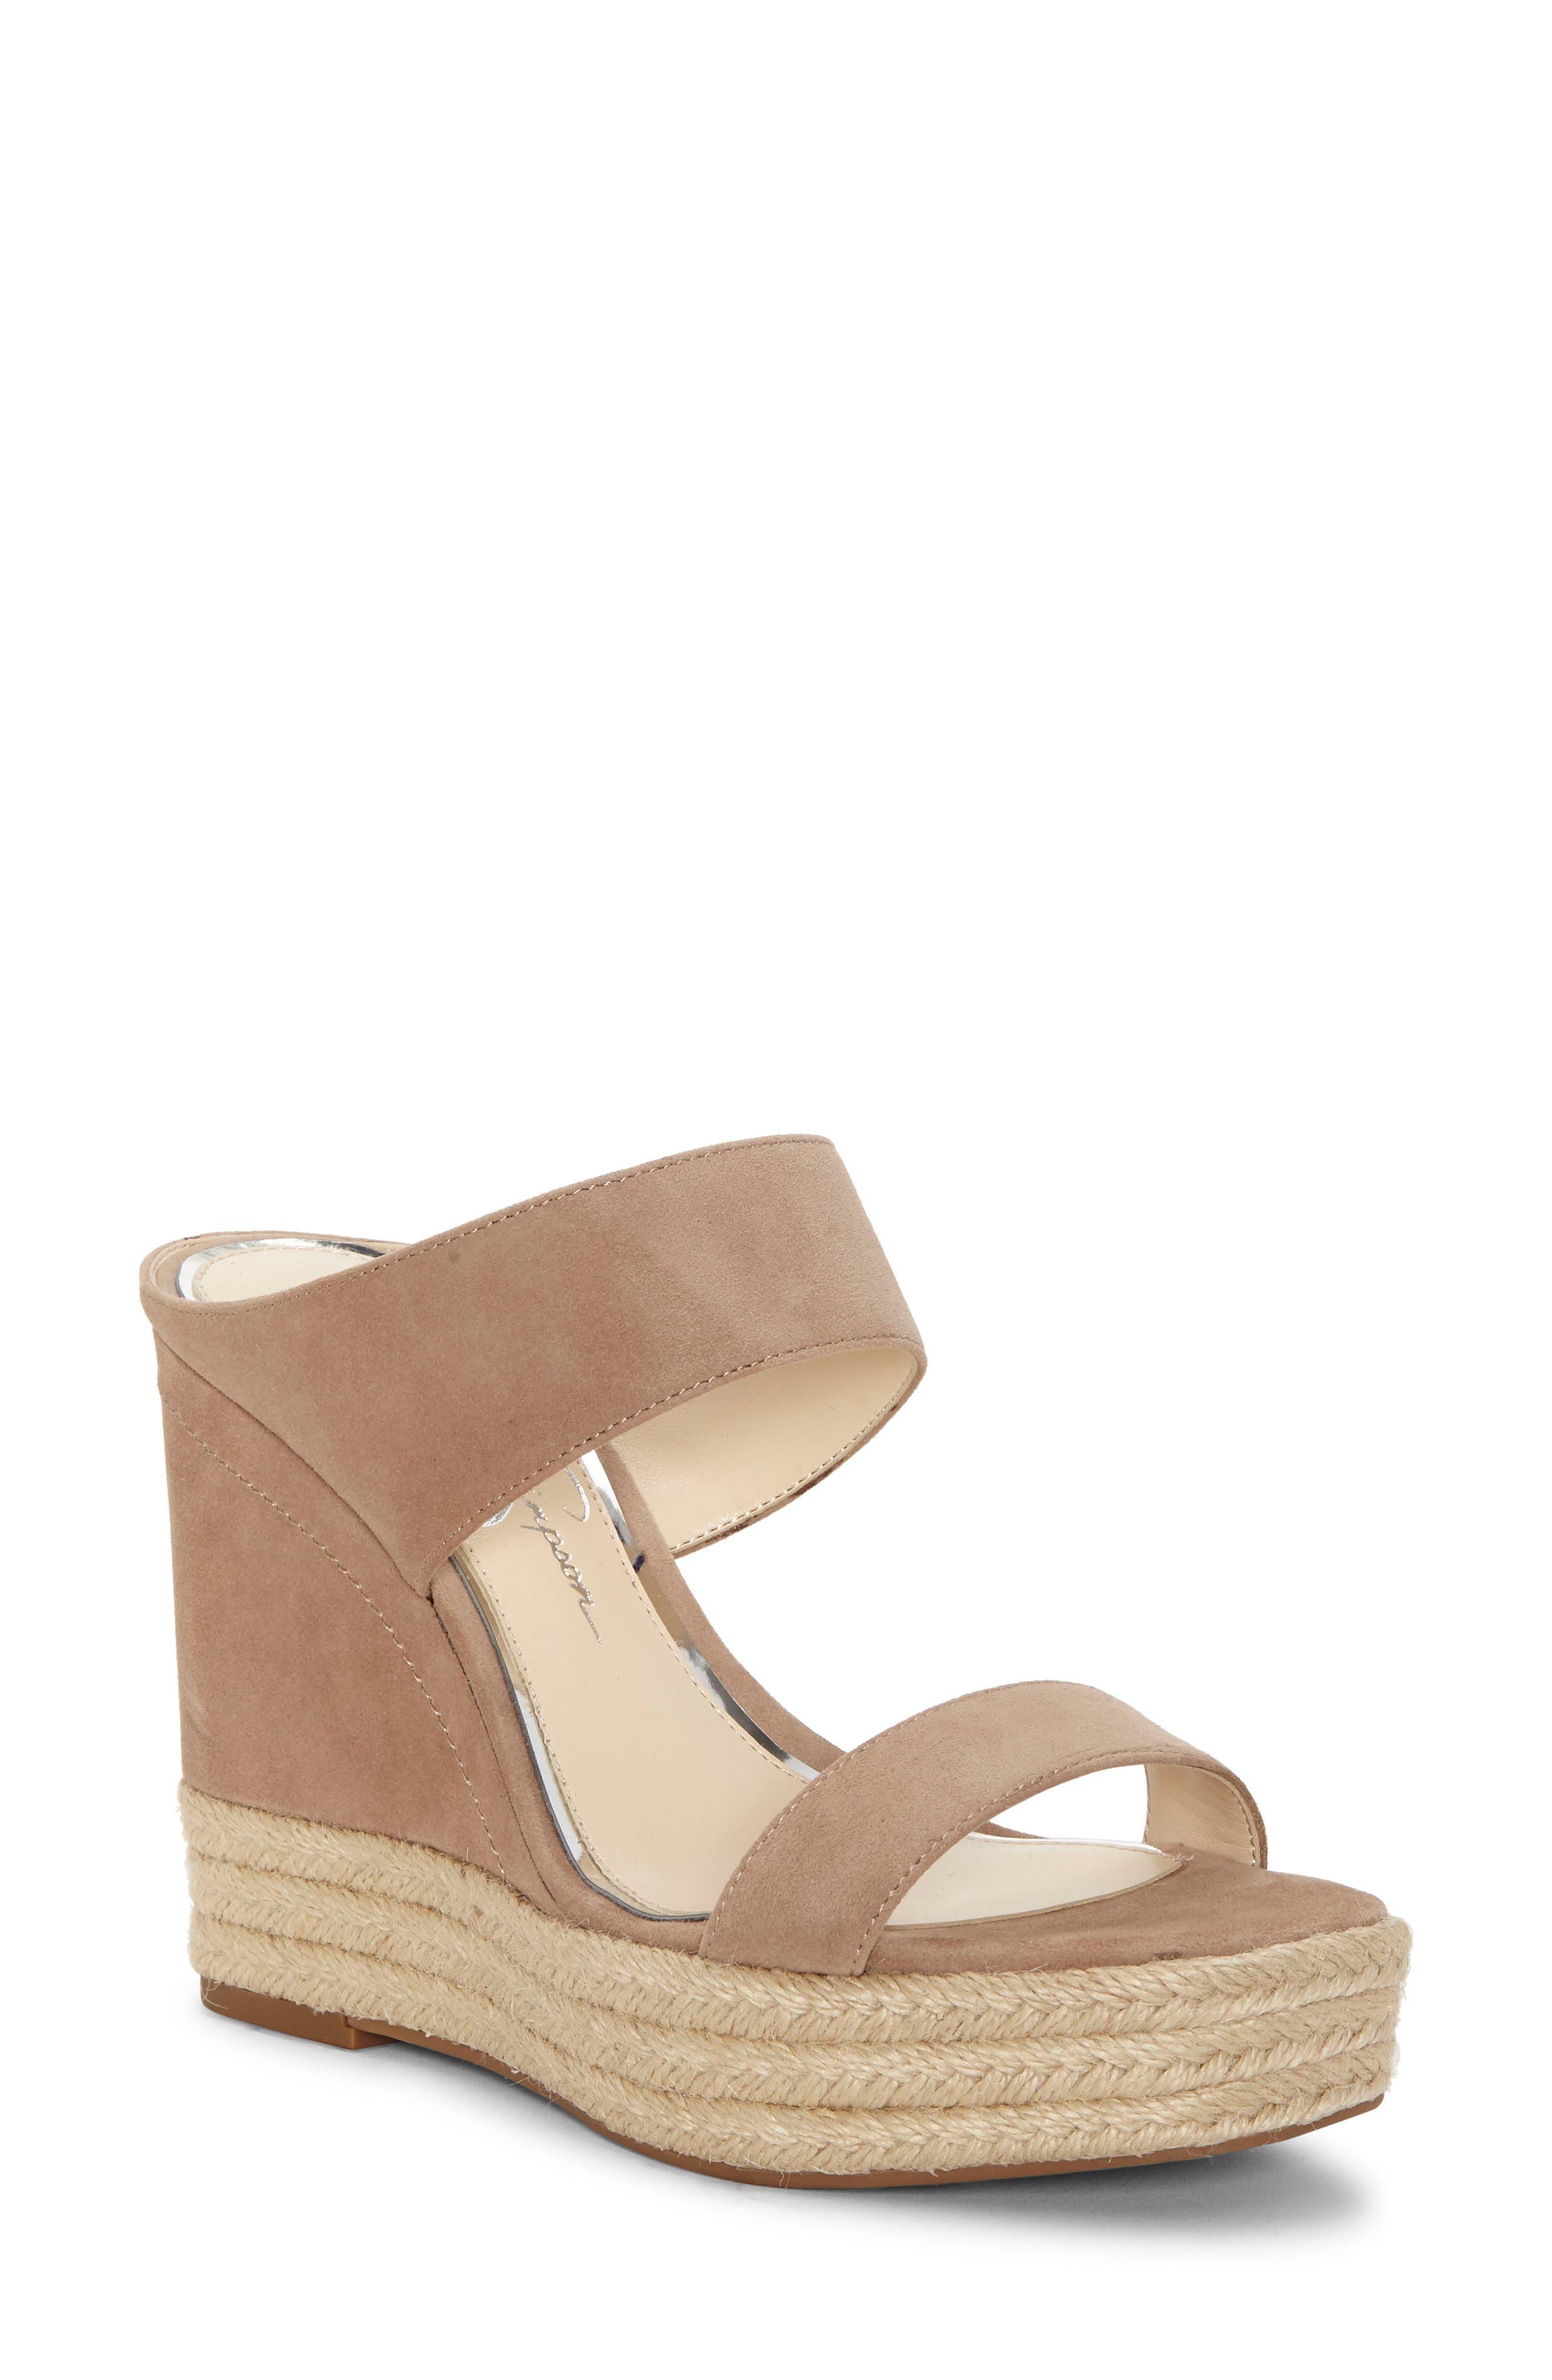 Jessica Simpson Siera Espadrille Wedge Slide Sandal, Brown